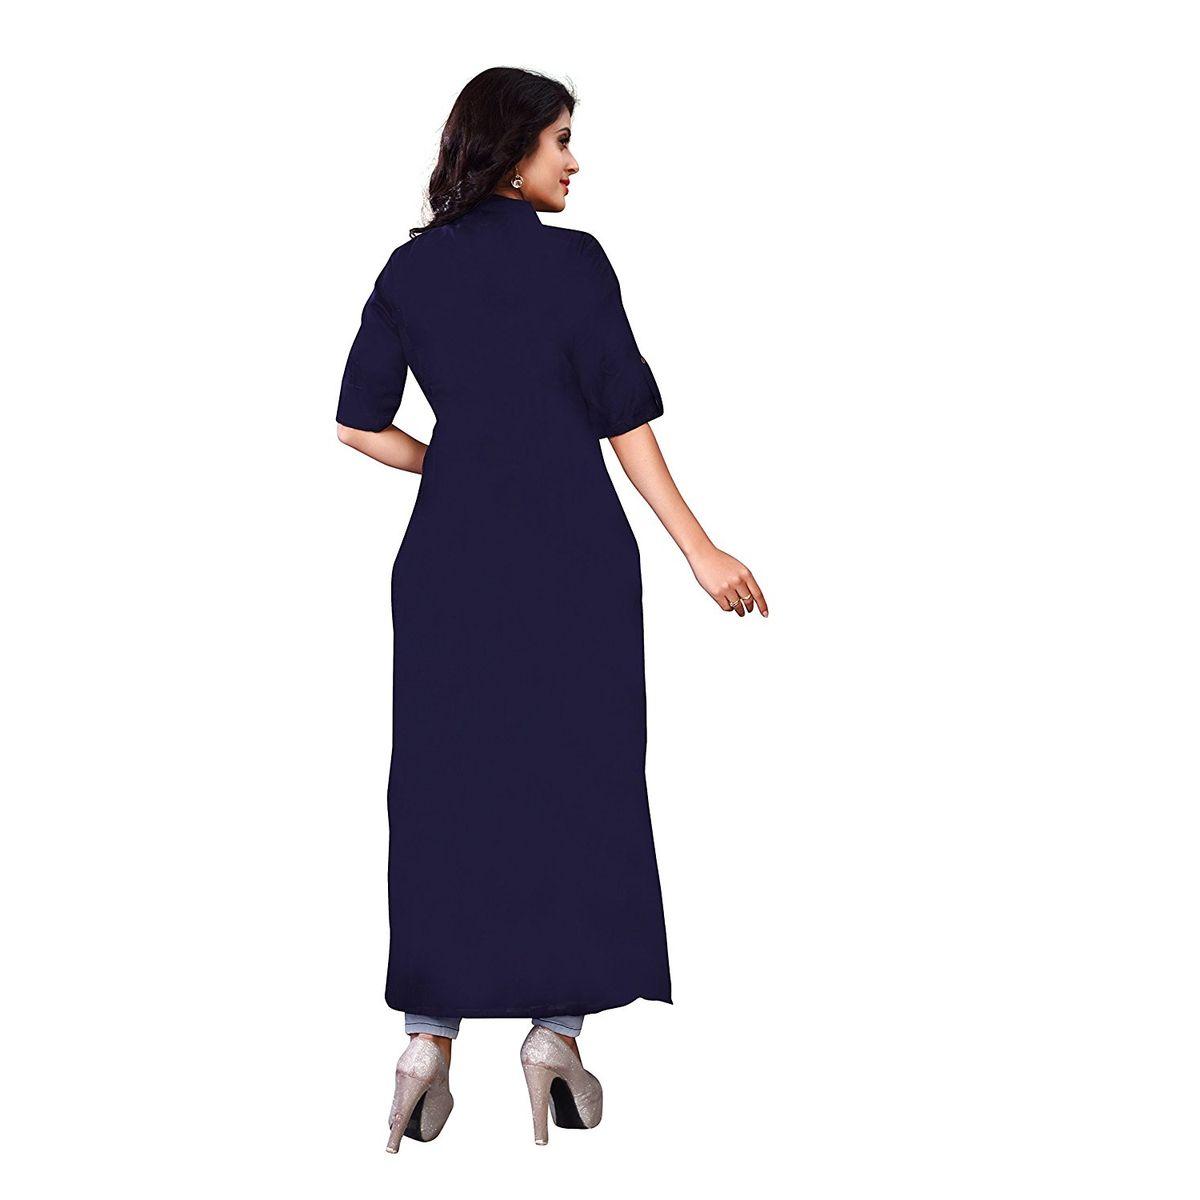 Kurti Womens Clothing Kurti for Women Latest Designer Wear Kurti Collection in Latest Kurti Beautiful Bollywood Kurti for Women Party wear Offer Designer Kurti-B0788BS43S